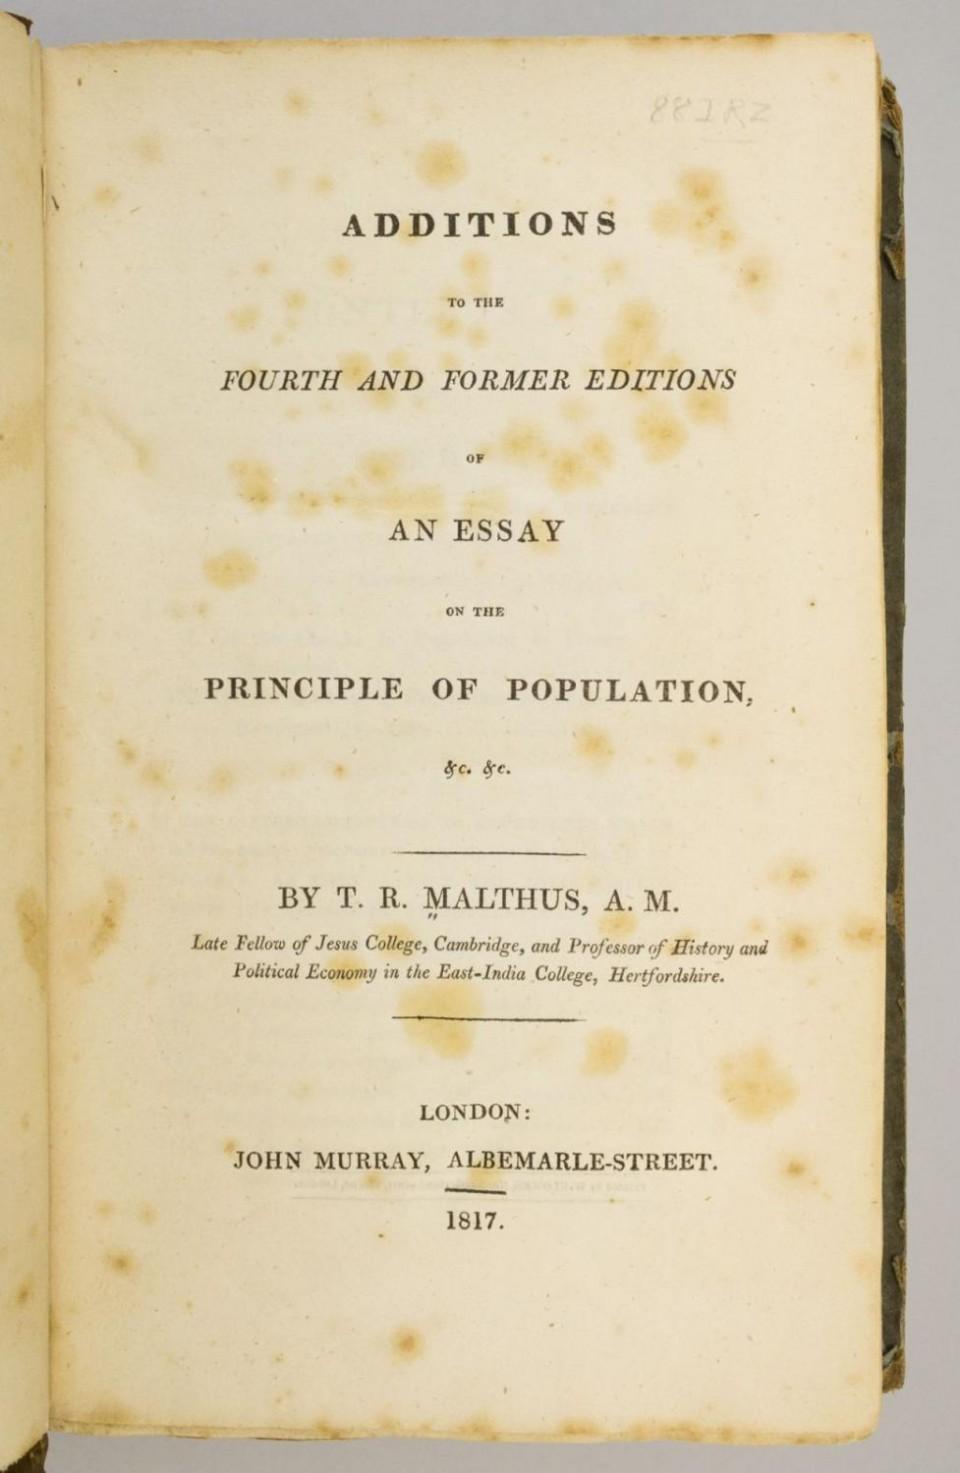 002 Essay Example On The Principle Of Population 5337830061 2 Singular Malthus Sparknotes Thomas Main Idea 960